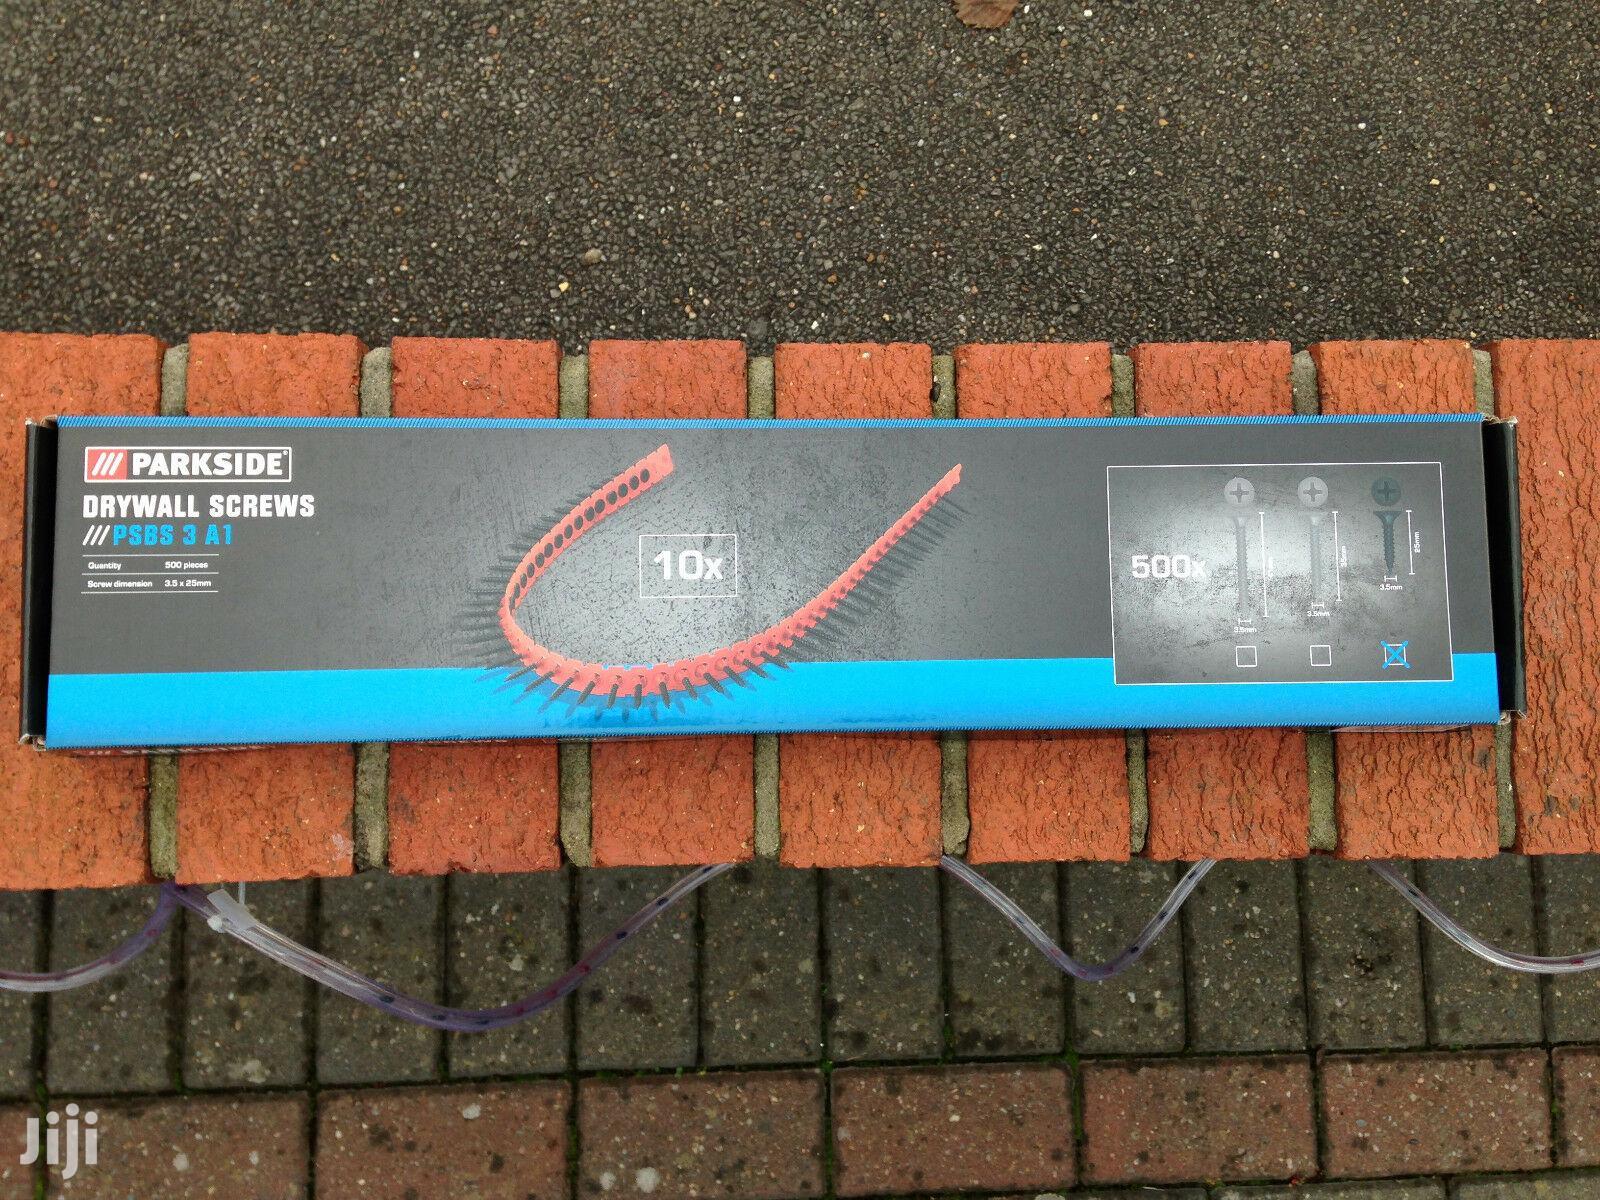 Parkside Drywall Screws 10 X / PSBS 3 A1 500 Pieces